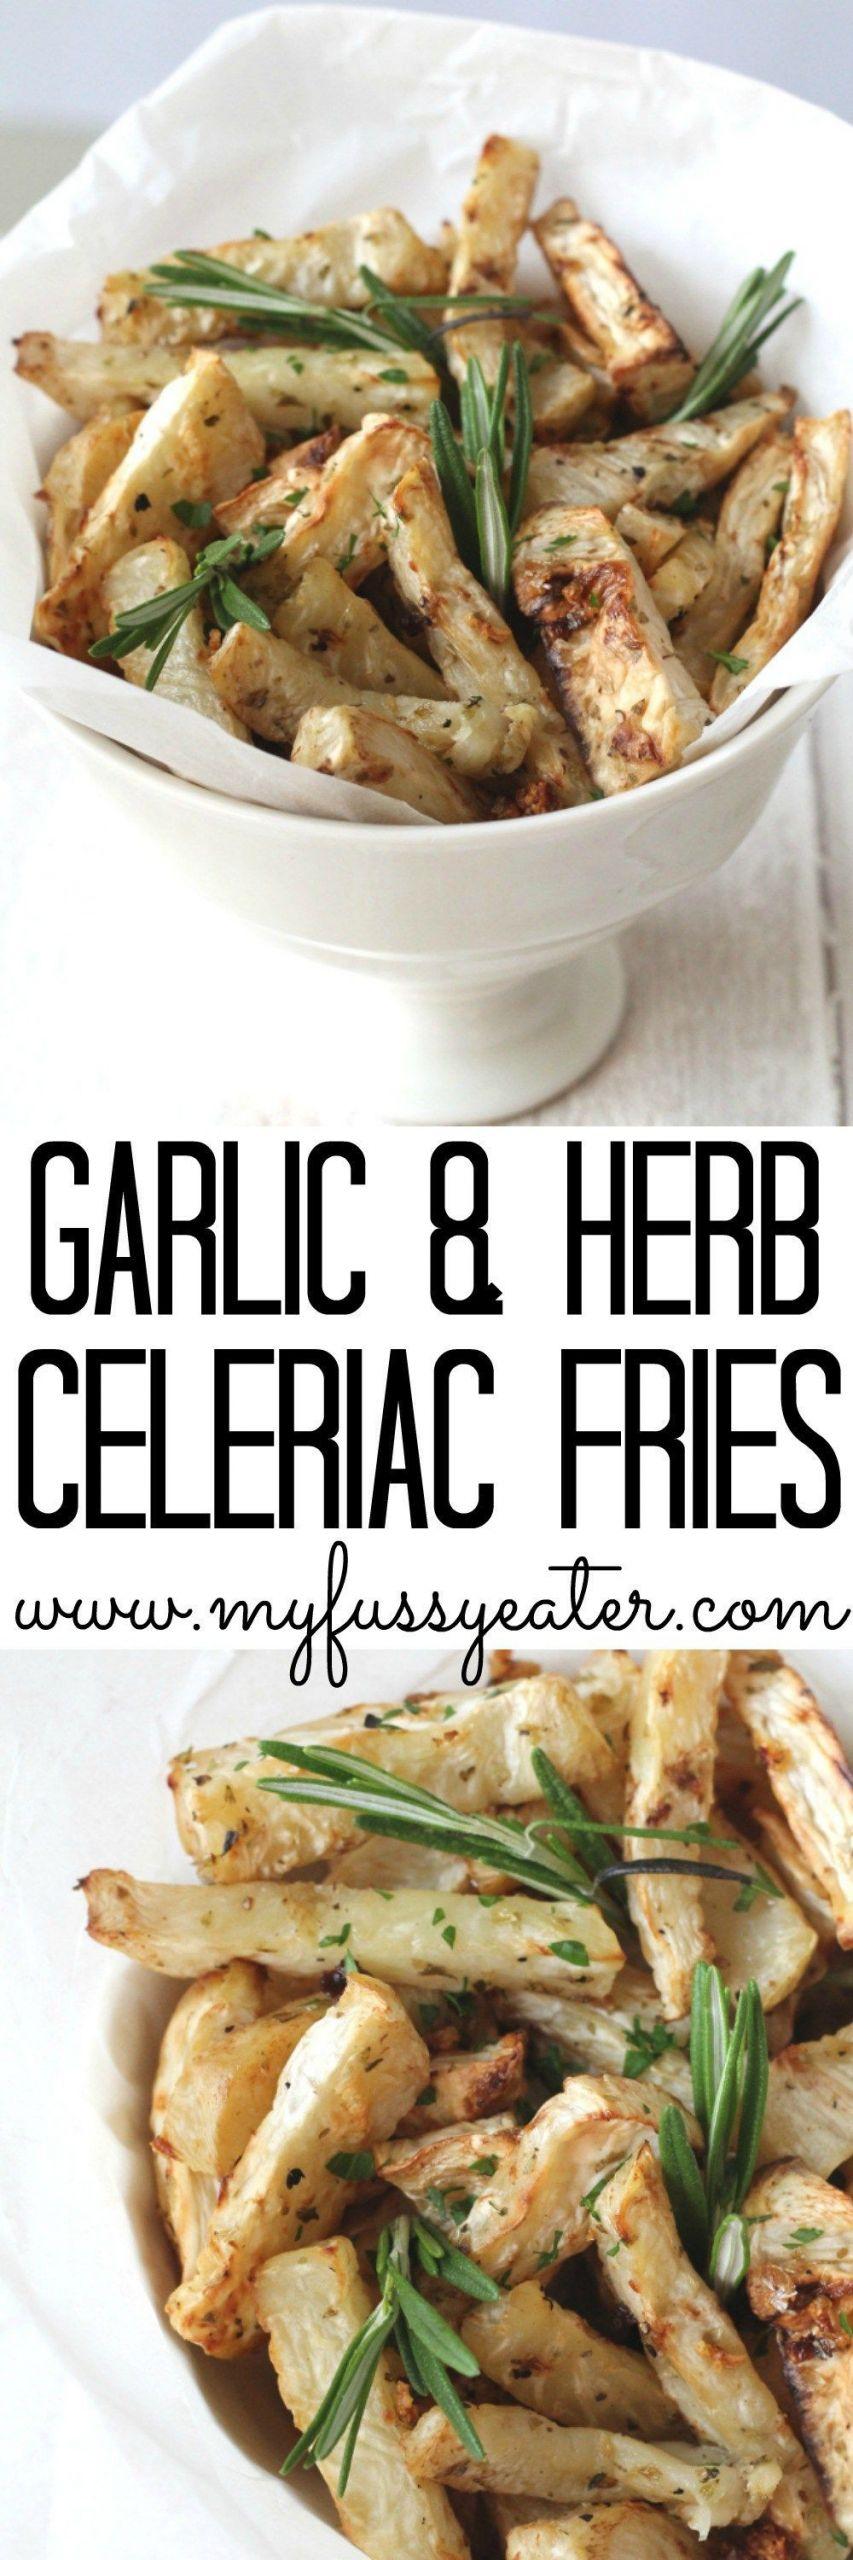 Low Cholesterol Side Dishes  Garlic & Herb Celeriac Fries Recipe